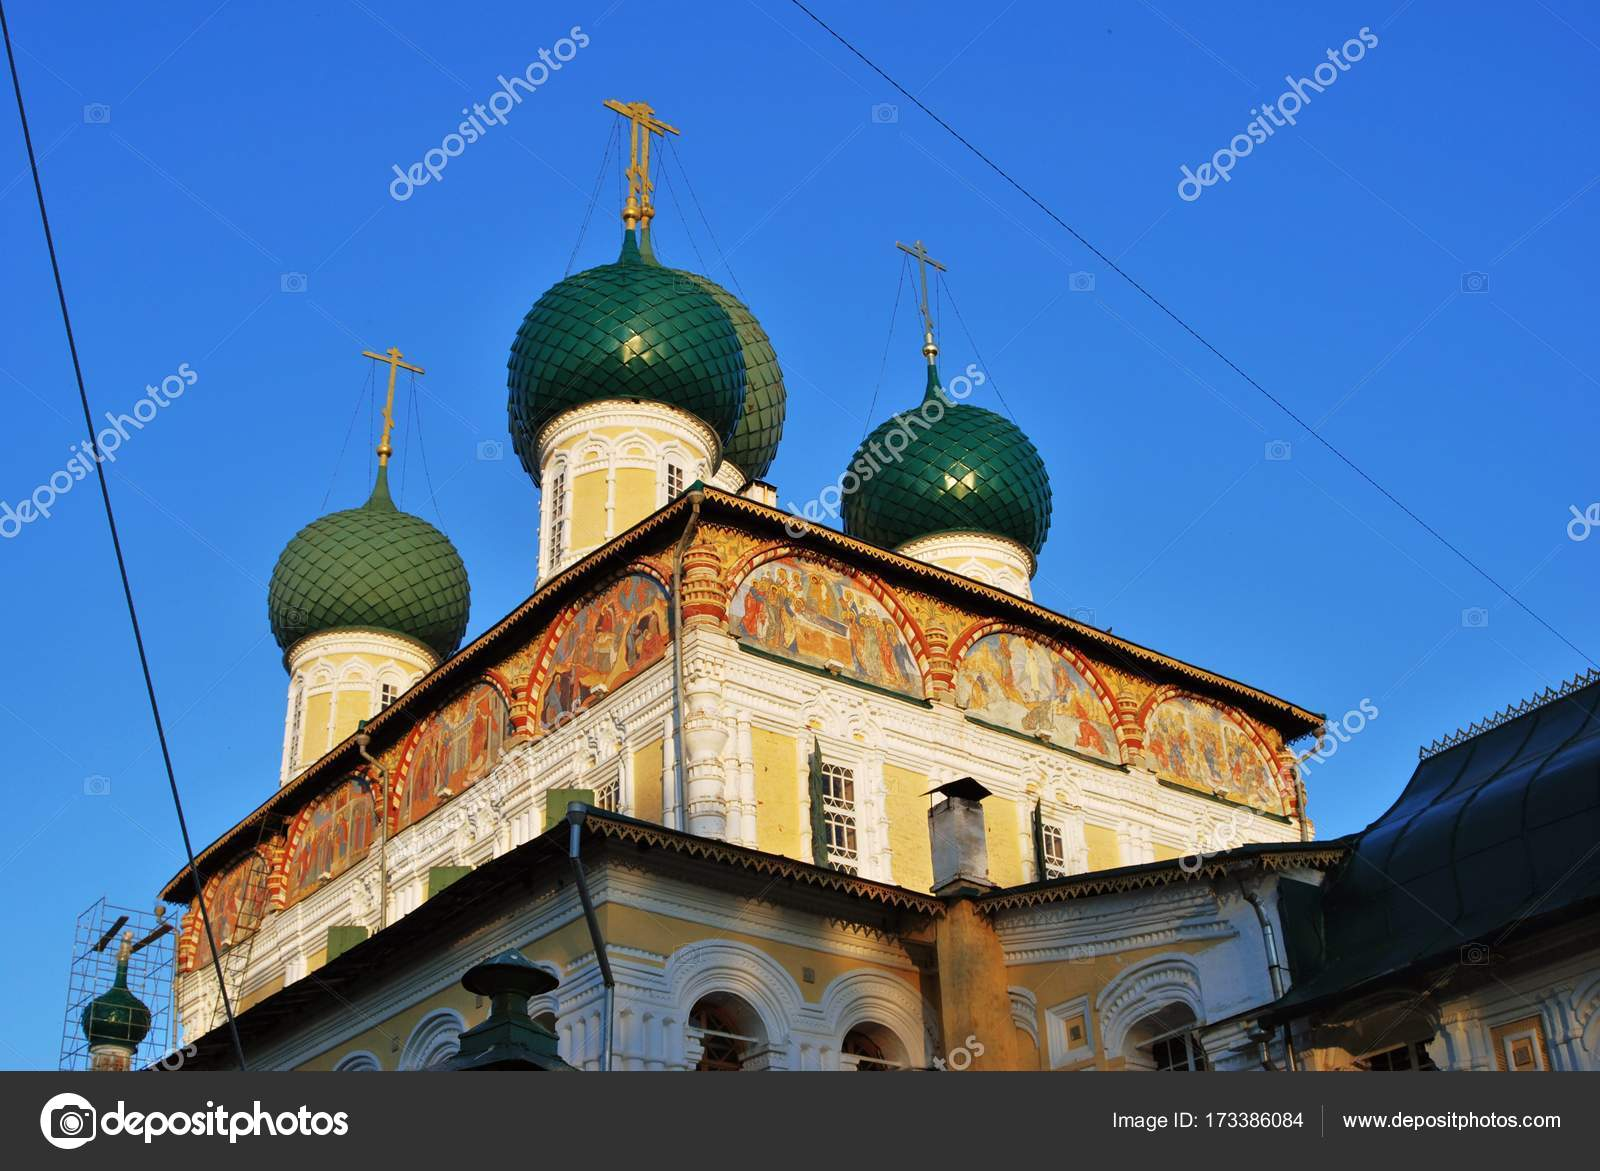 Resurrection Cathedral Tutaev: photos, address and history 74